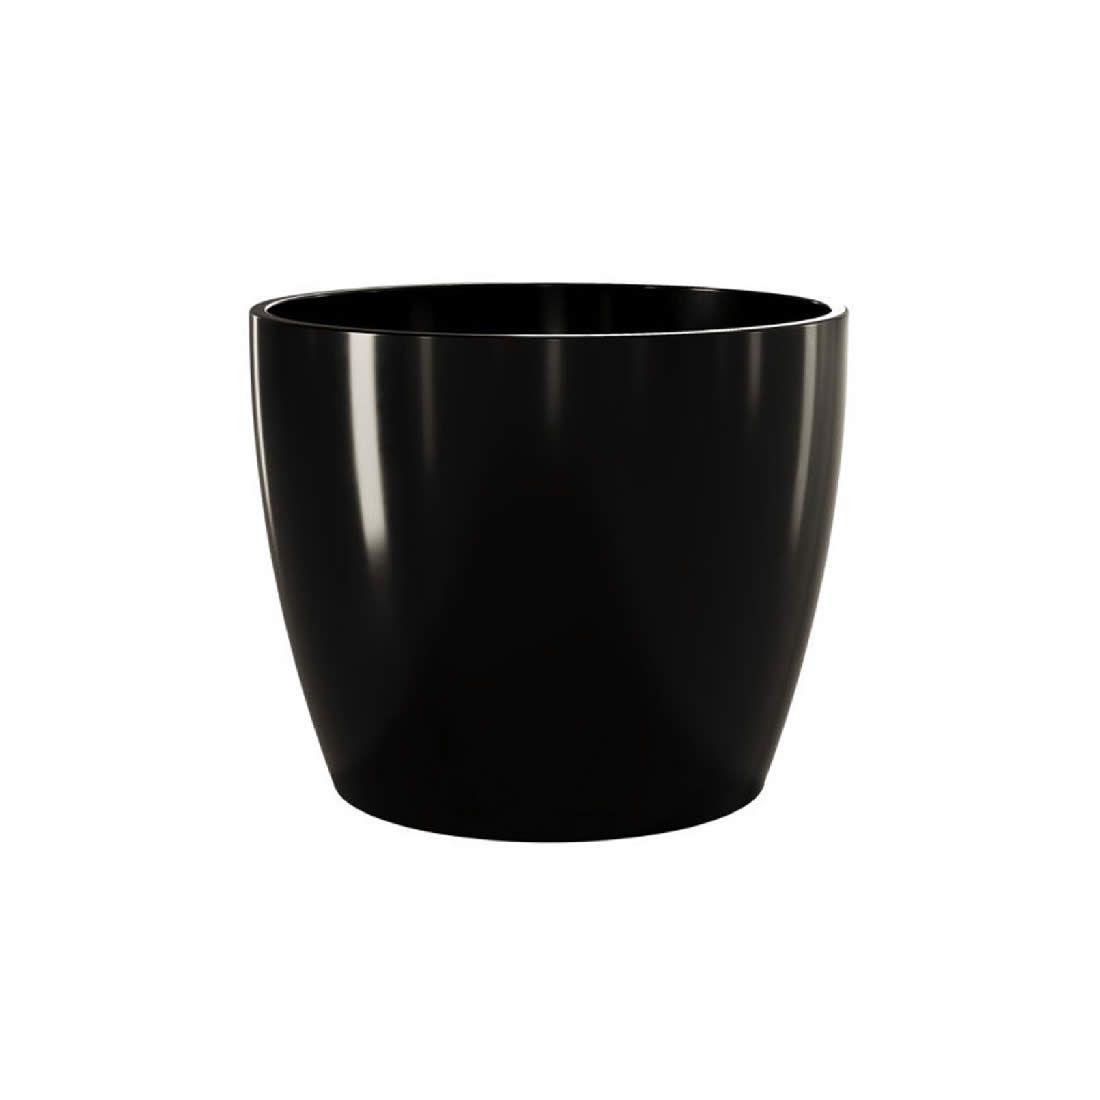 Vaso Para Planta Cerâmico Munique Preto 16 - Japi